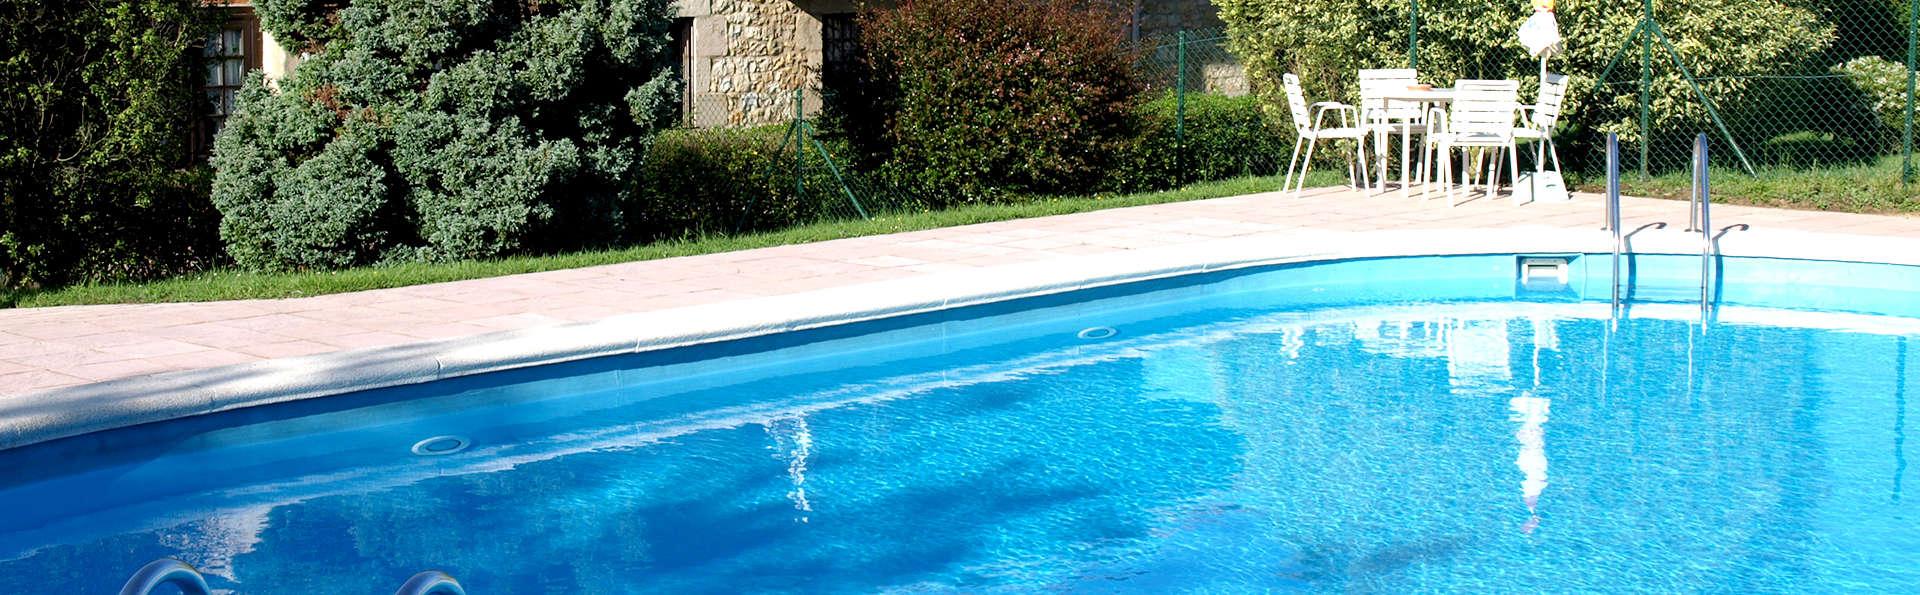 Hotel Siglo XVIII - Edit_Pool.jpg